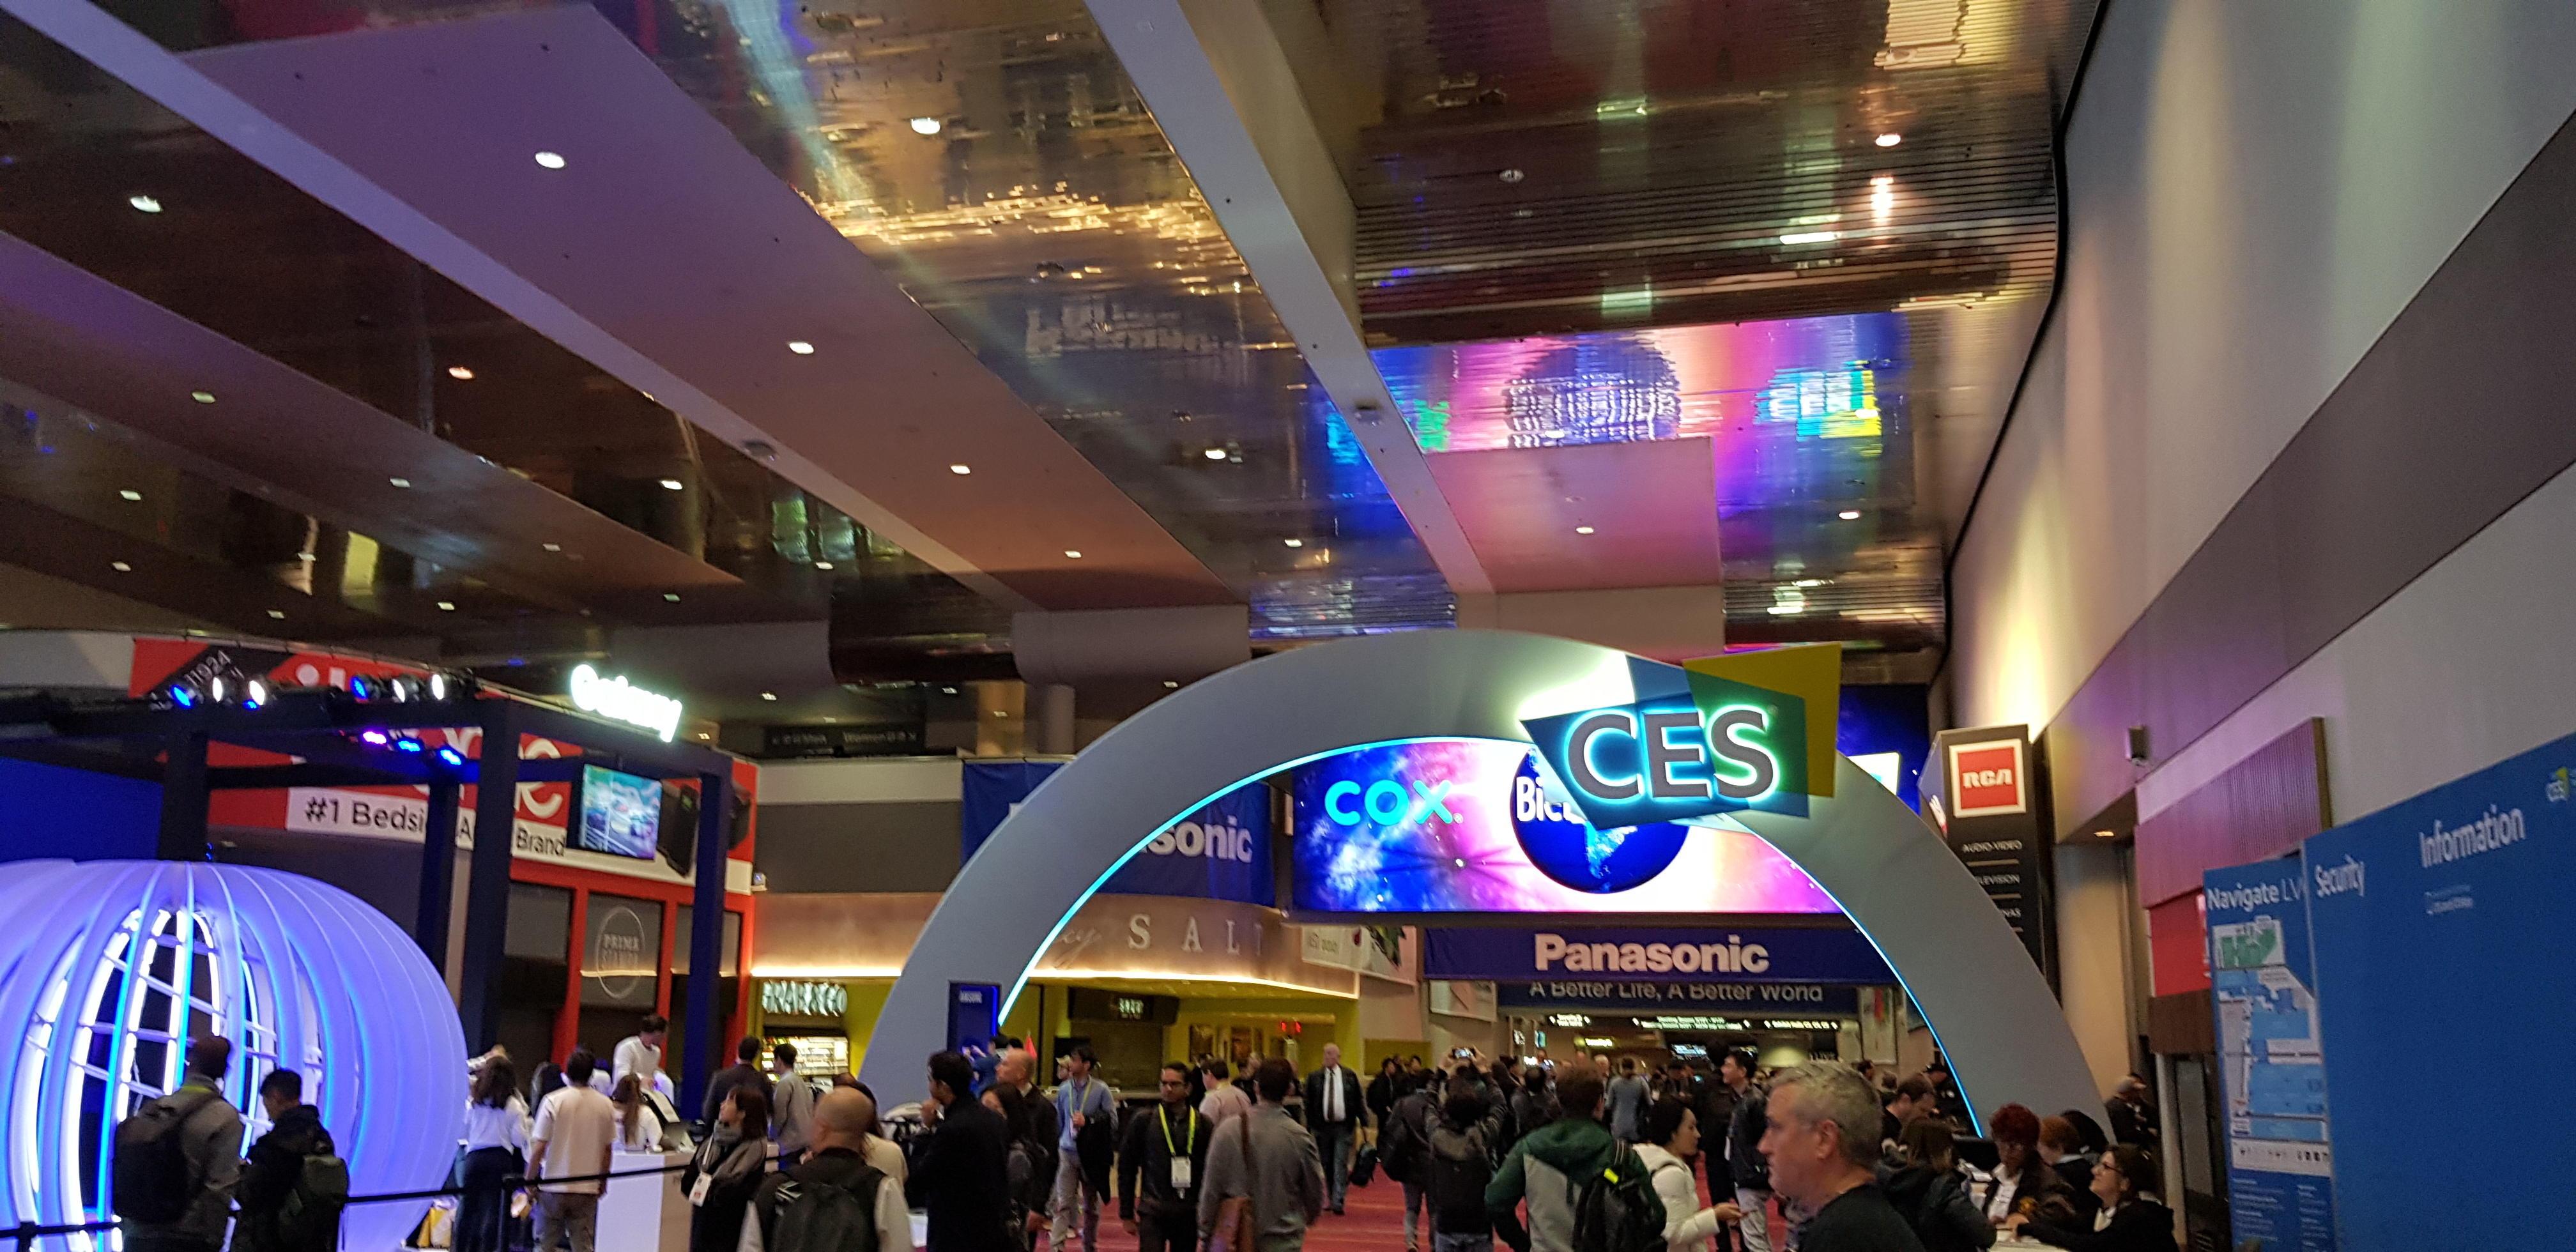 Las Vegas, al via CES 2019: la più grande fiera al mondo dedicata all hi-tech